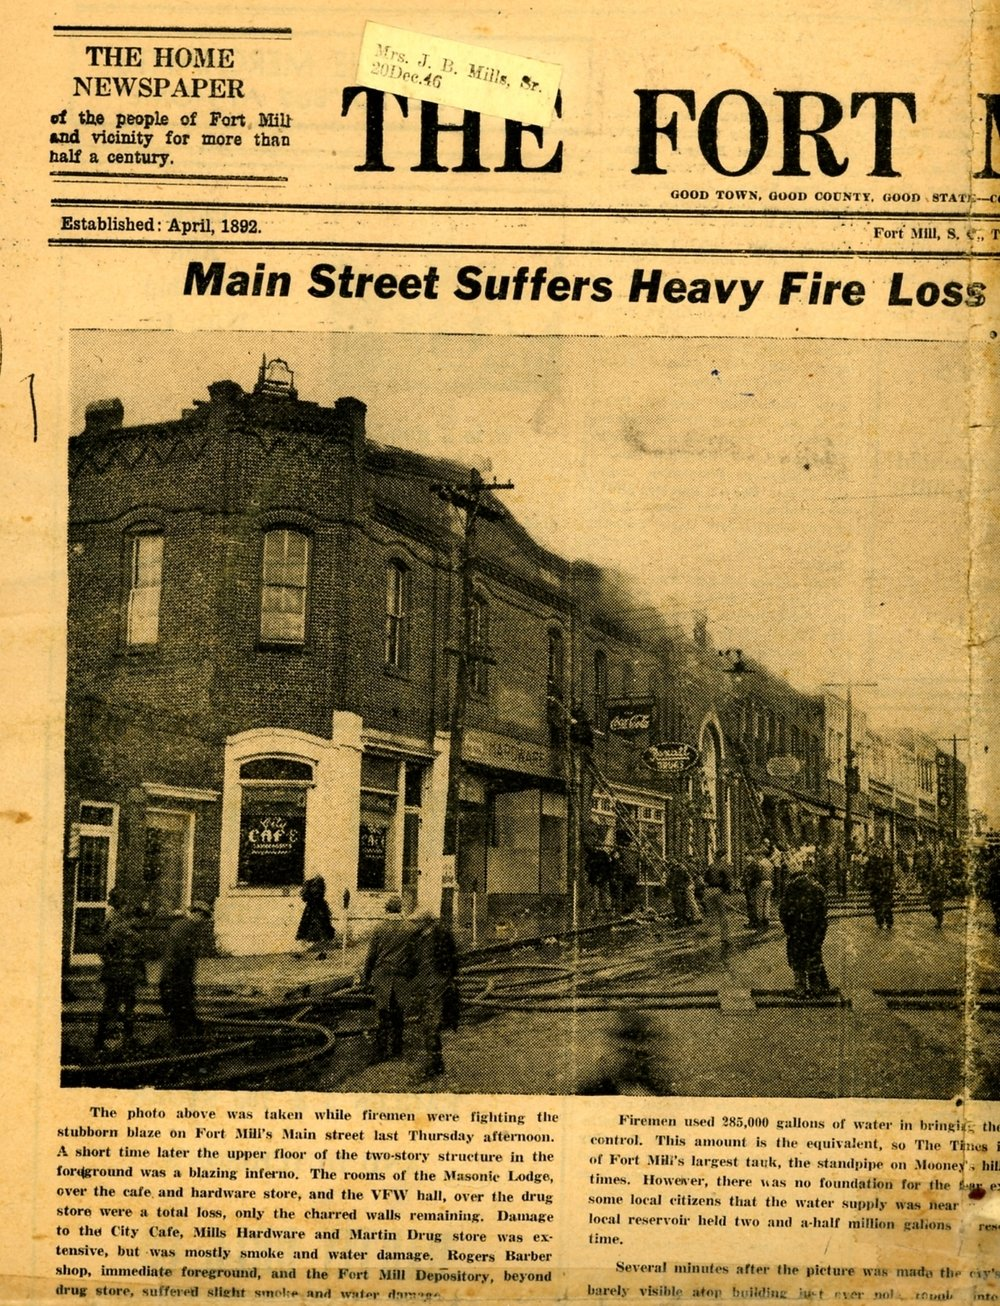 1940s fire on Main Street